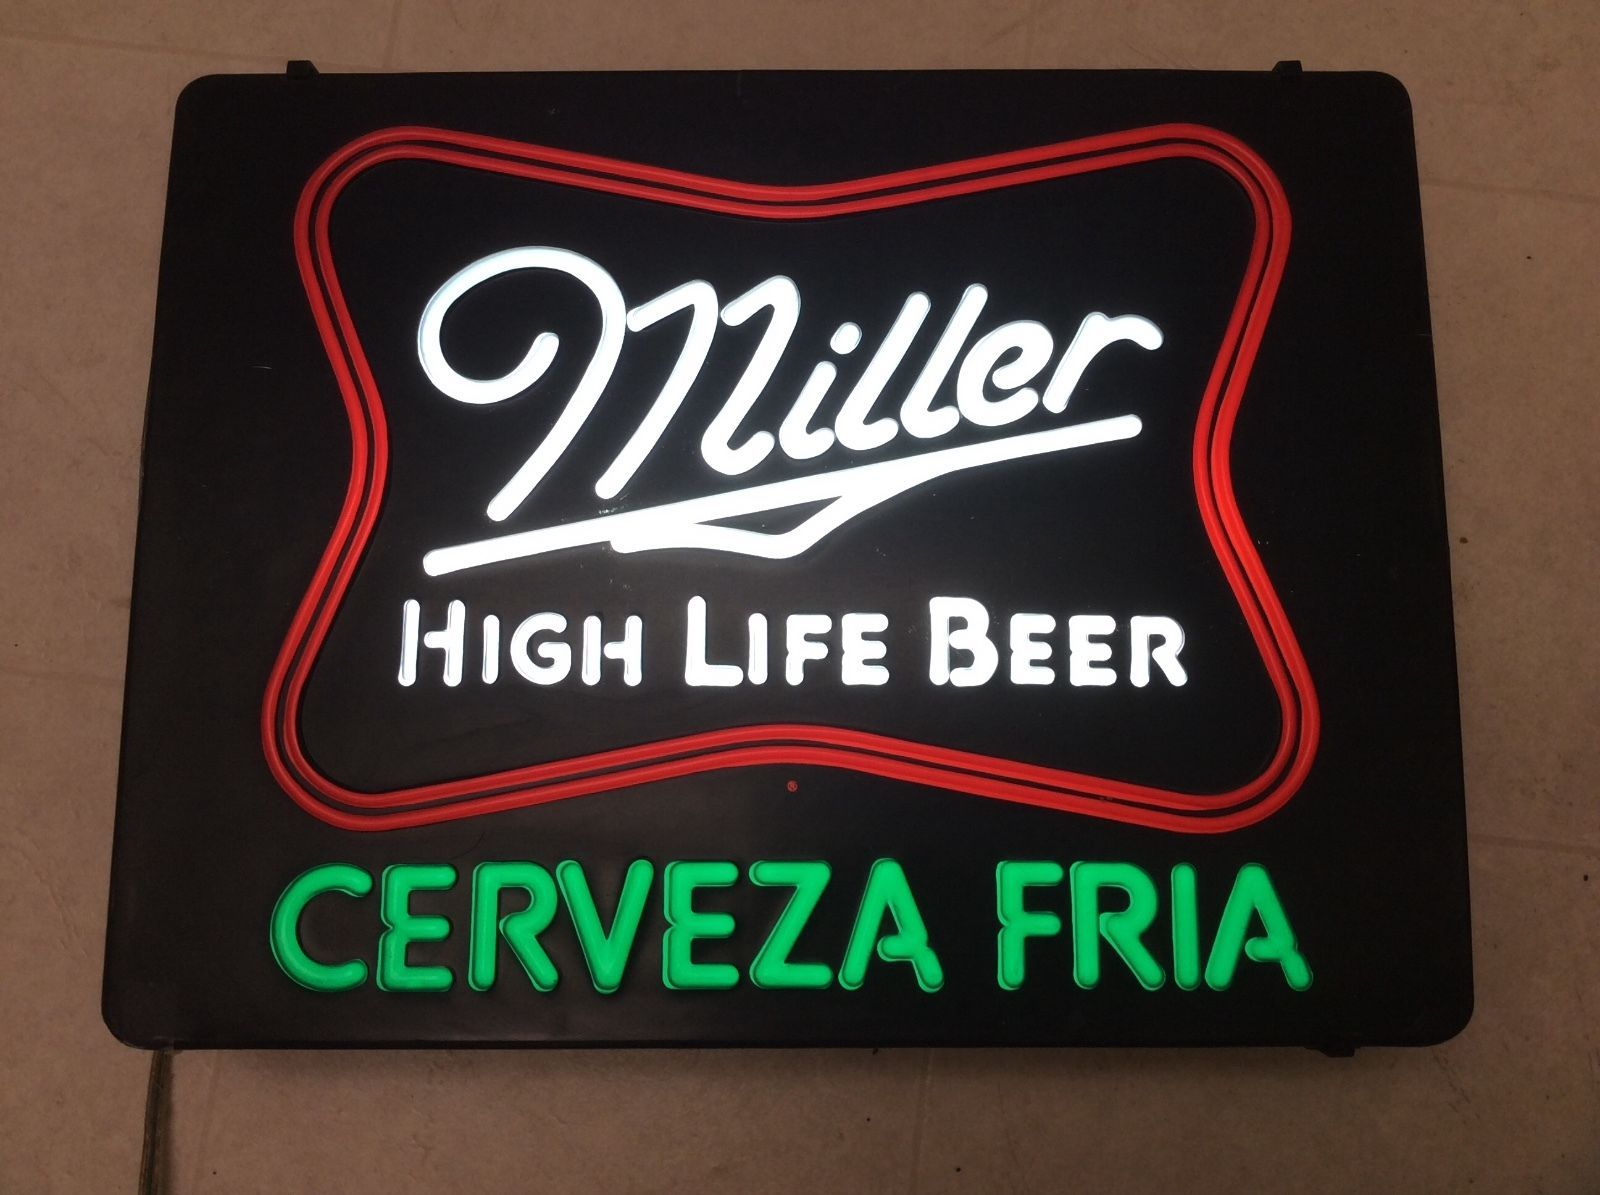 Vintage miller high life beer neon look light up sign bar gameroom vintage miller high life beer neon look light up sign bar gameroom cerveza fria aloadofball Choice Image